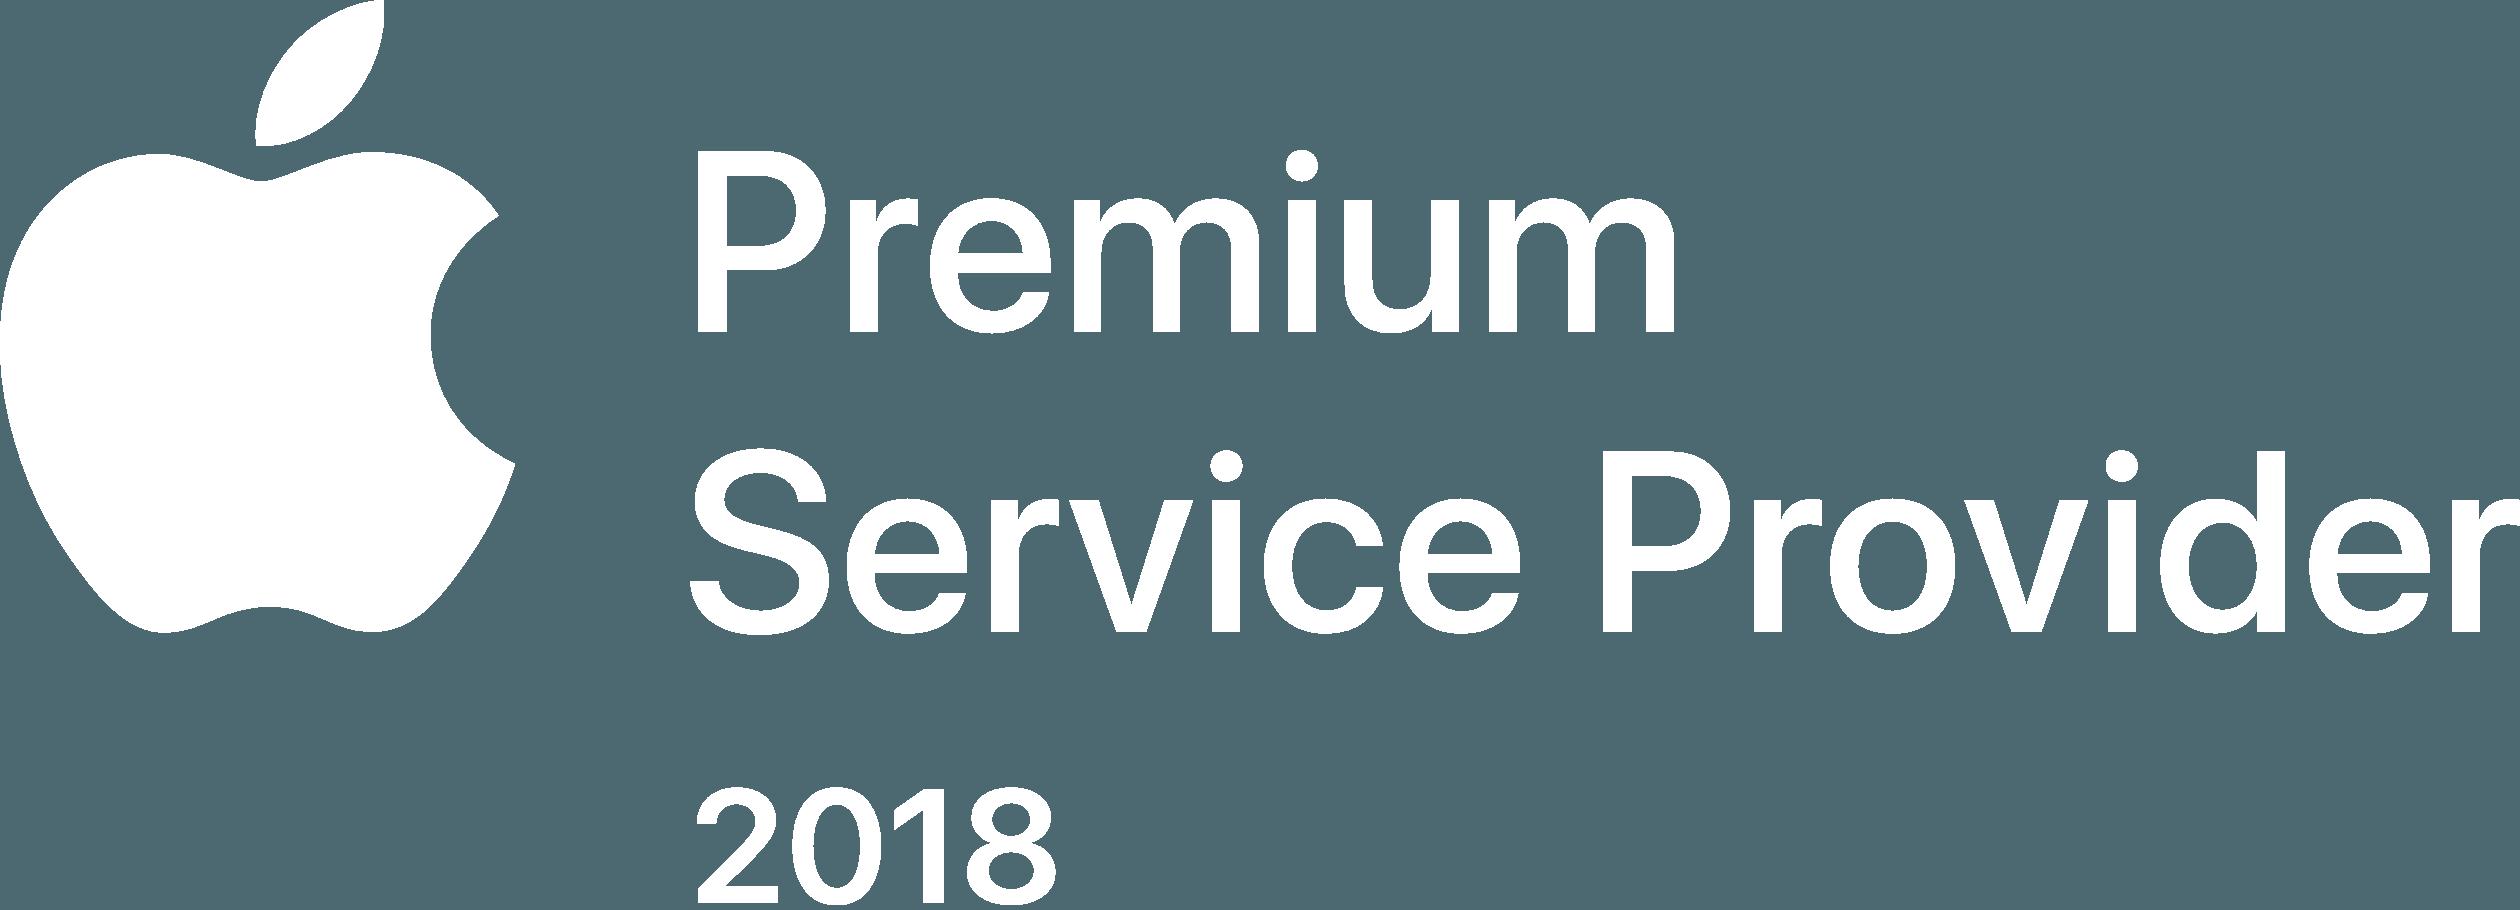 Premium-Service-Provider-2019